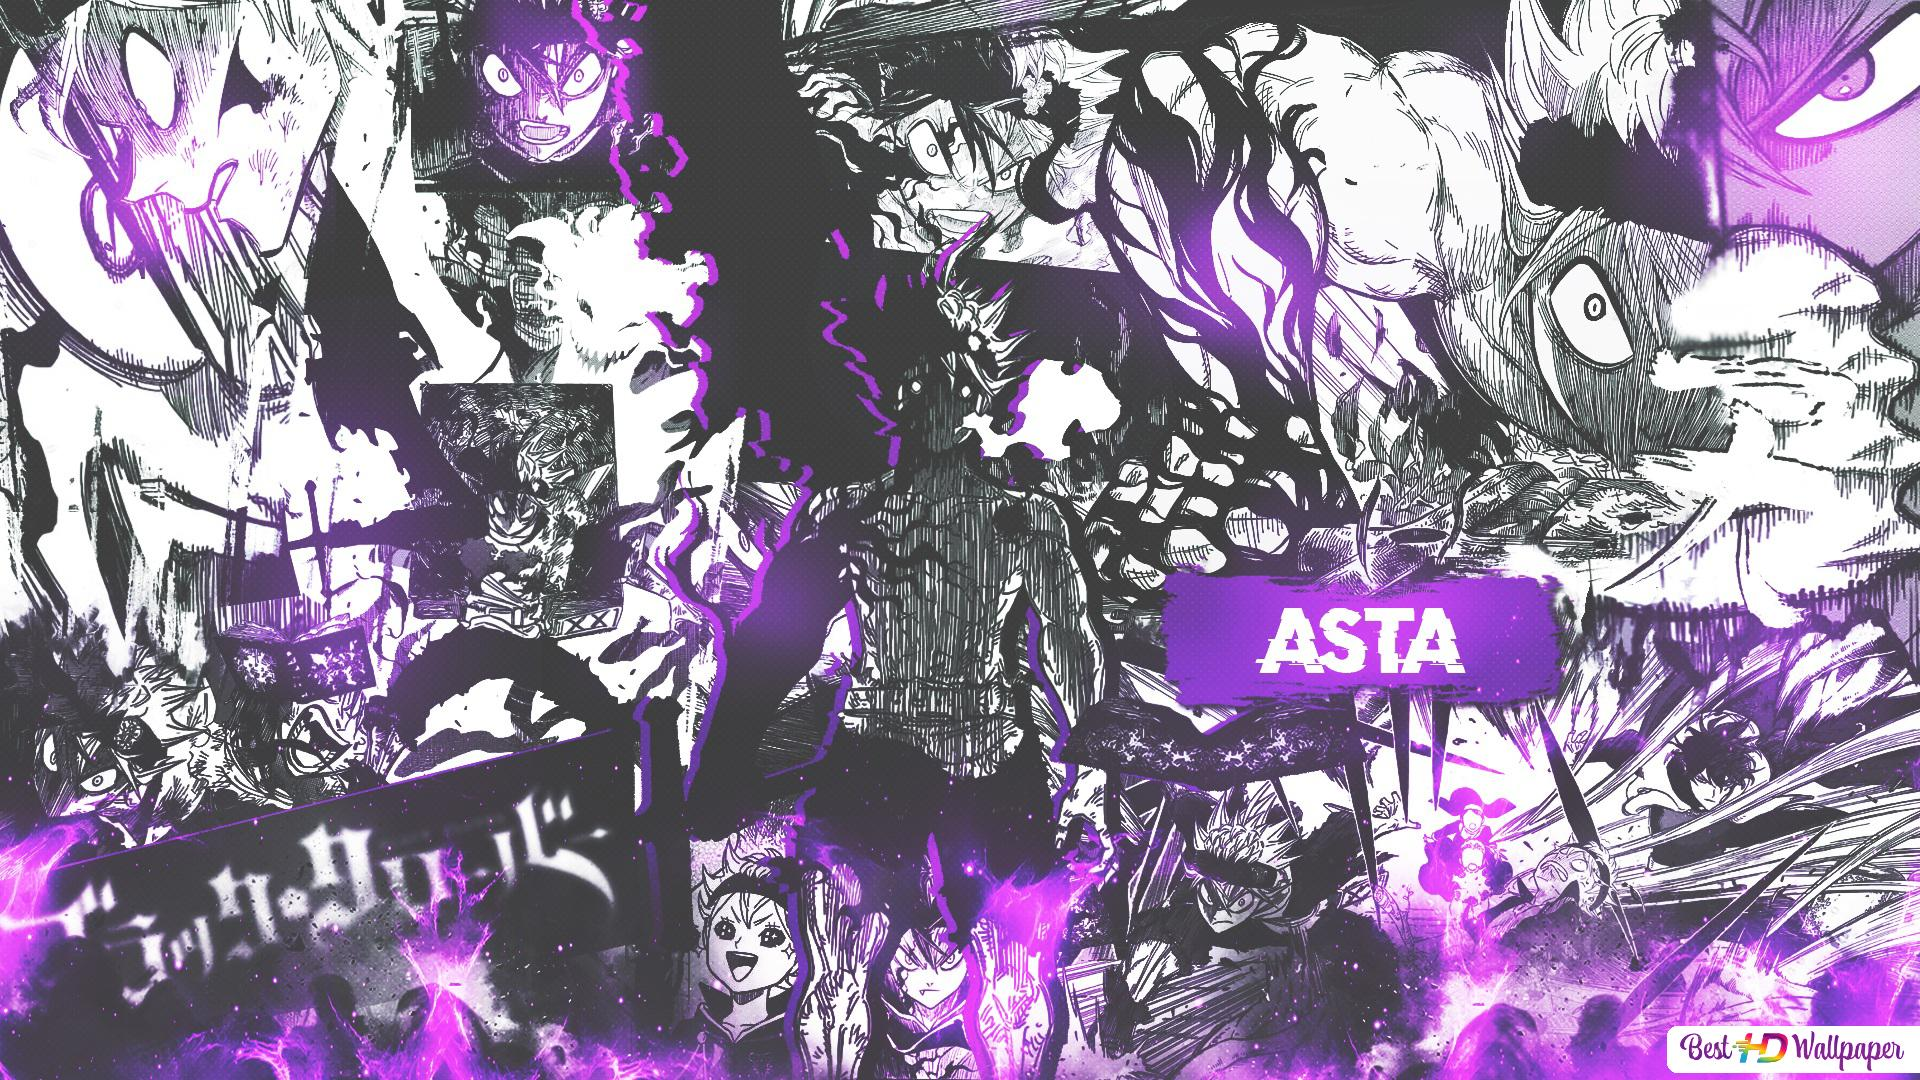 Asta Black Clover Phone Wallpaper - Anime Wallpaper HD